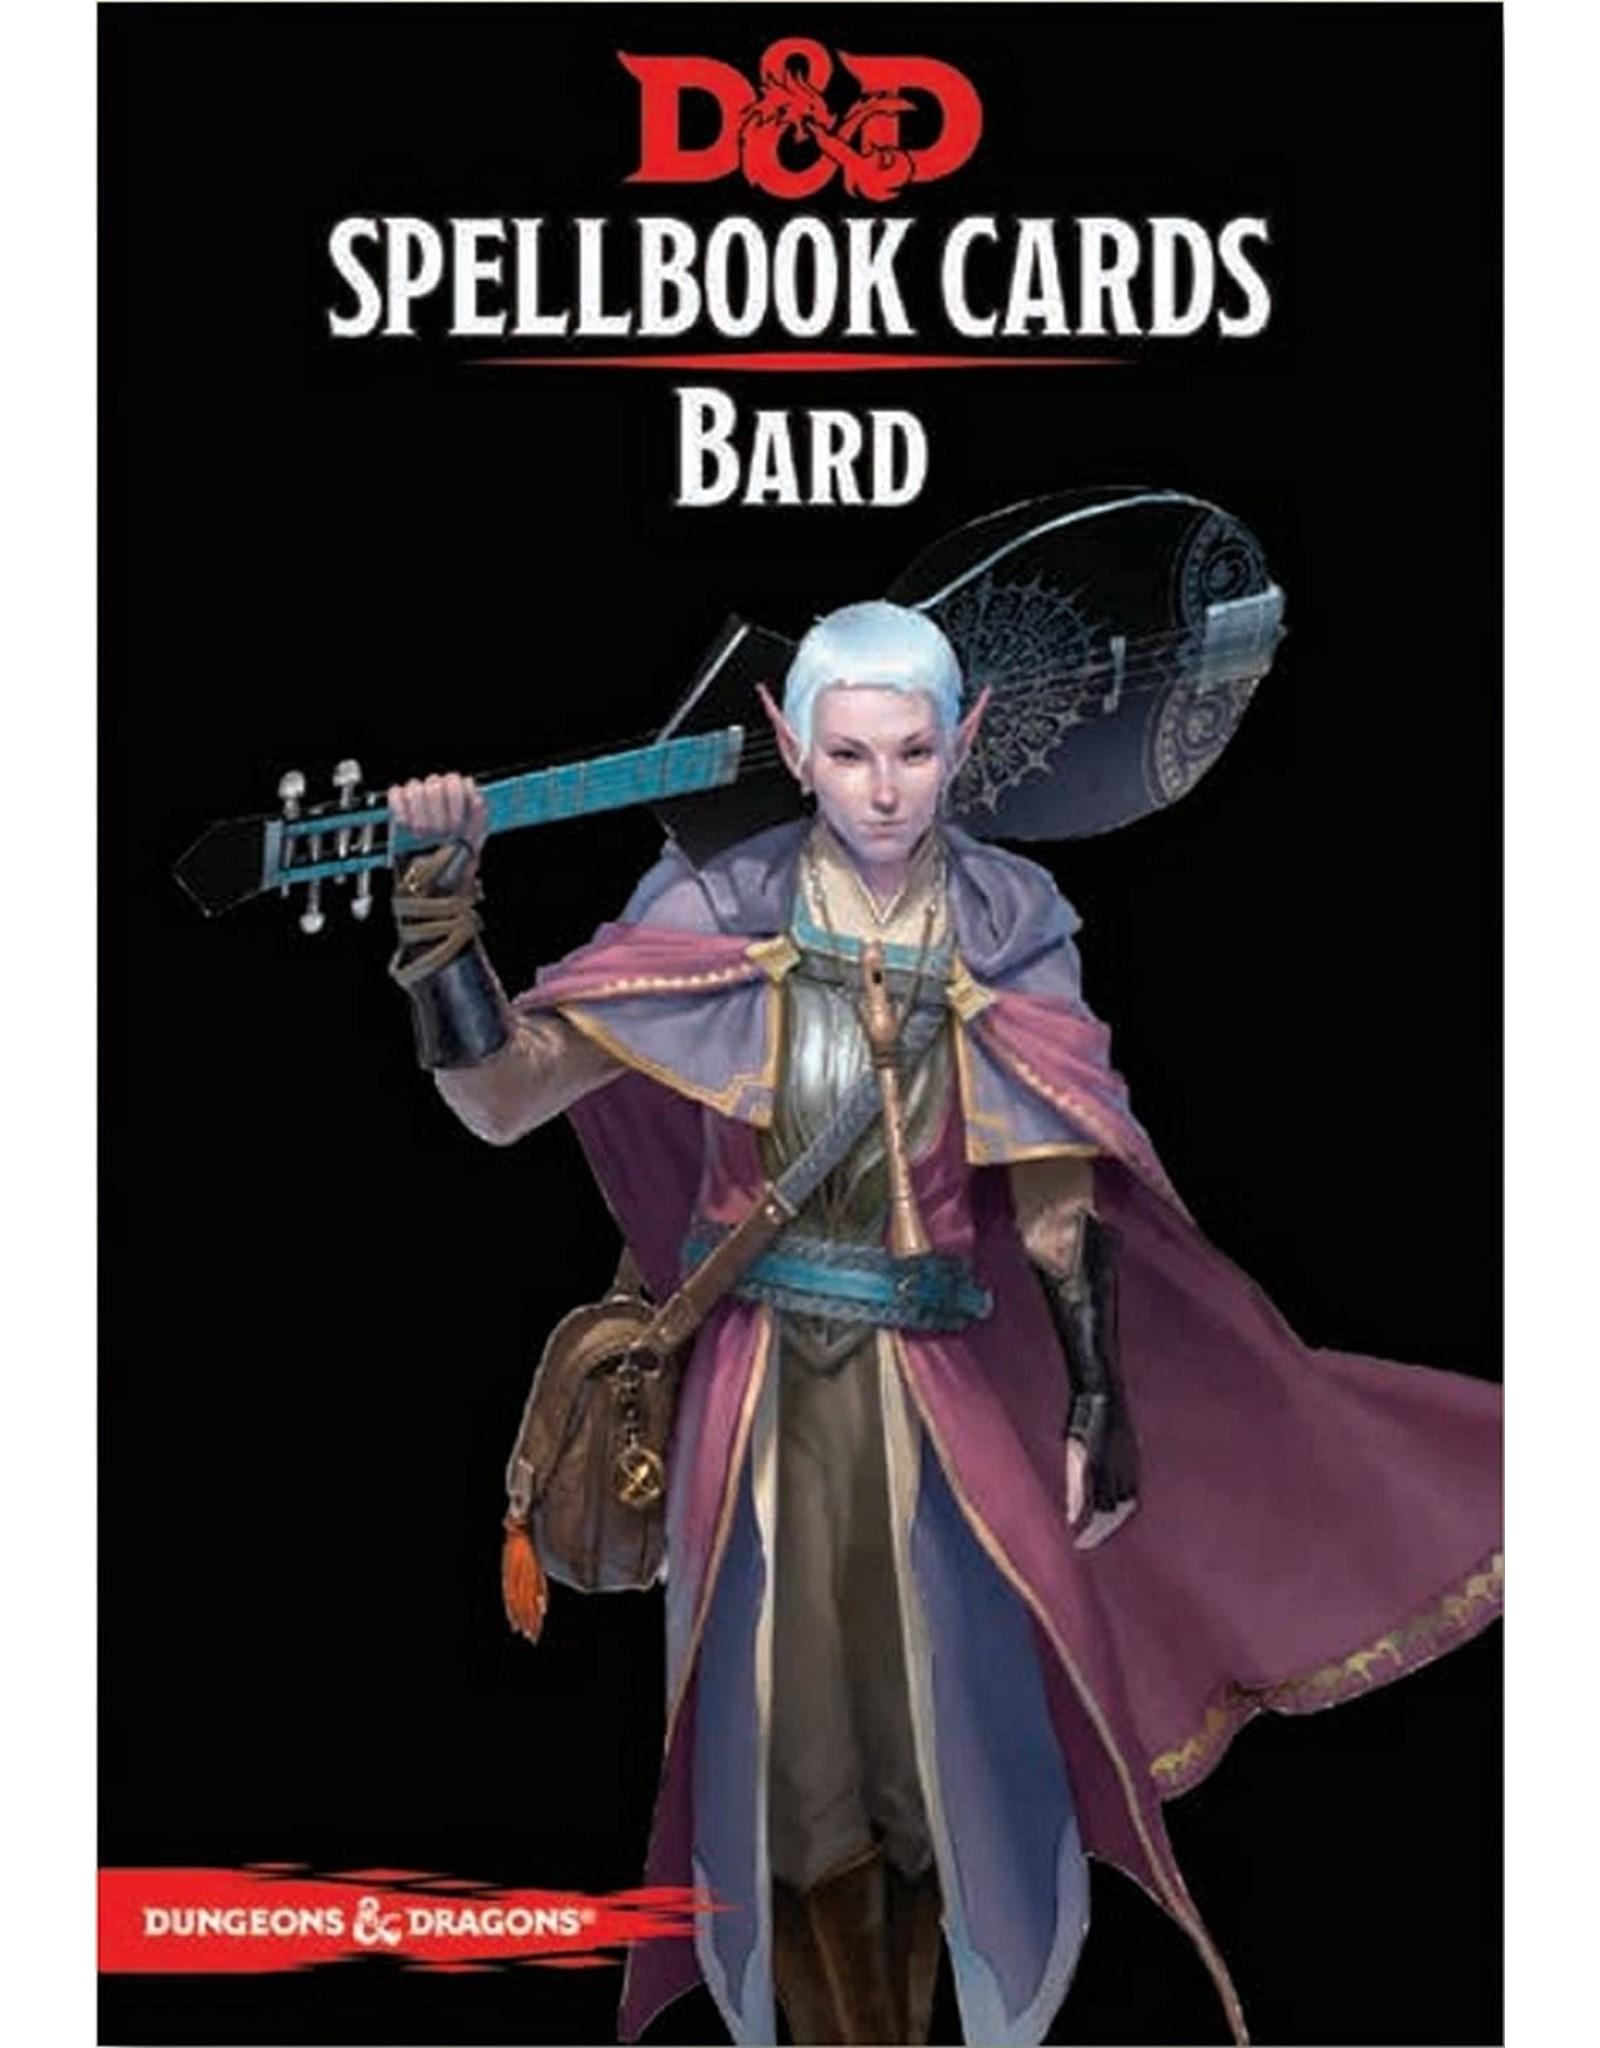 GaleForce9 D&D: Spellbook Cards: Bard Deck